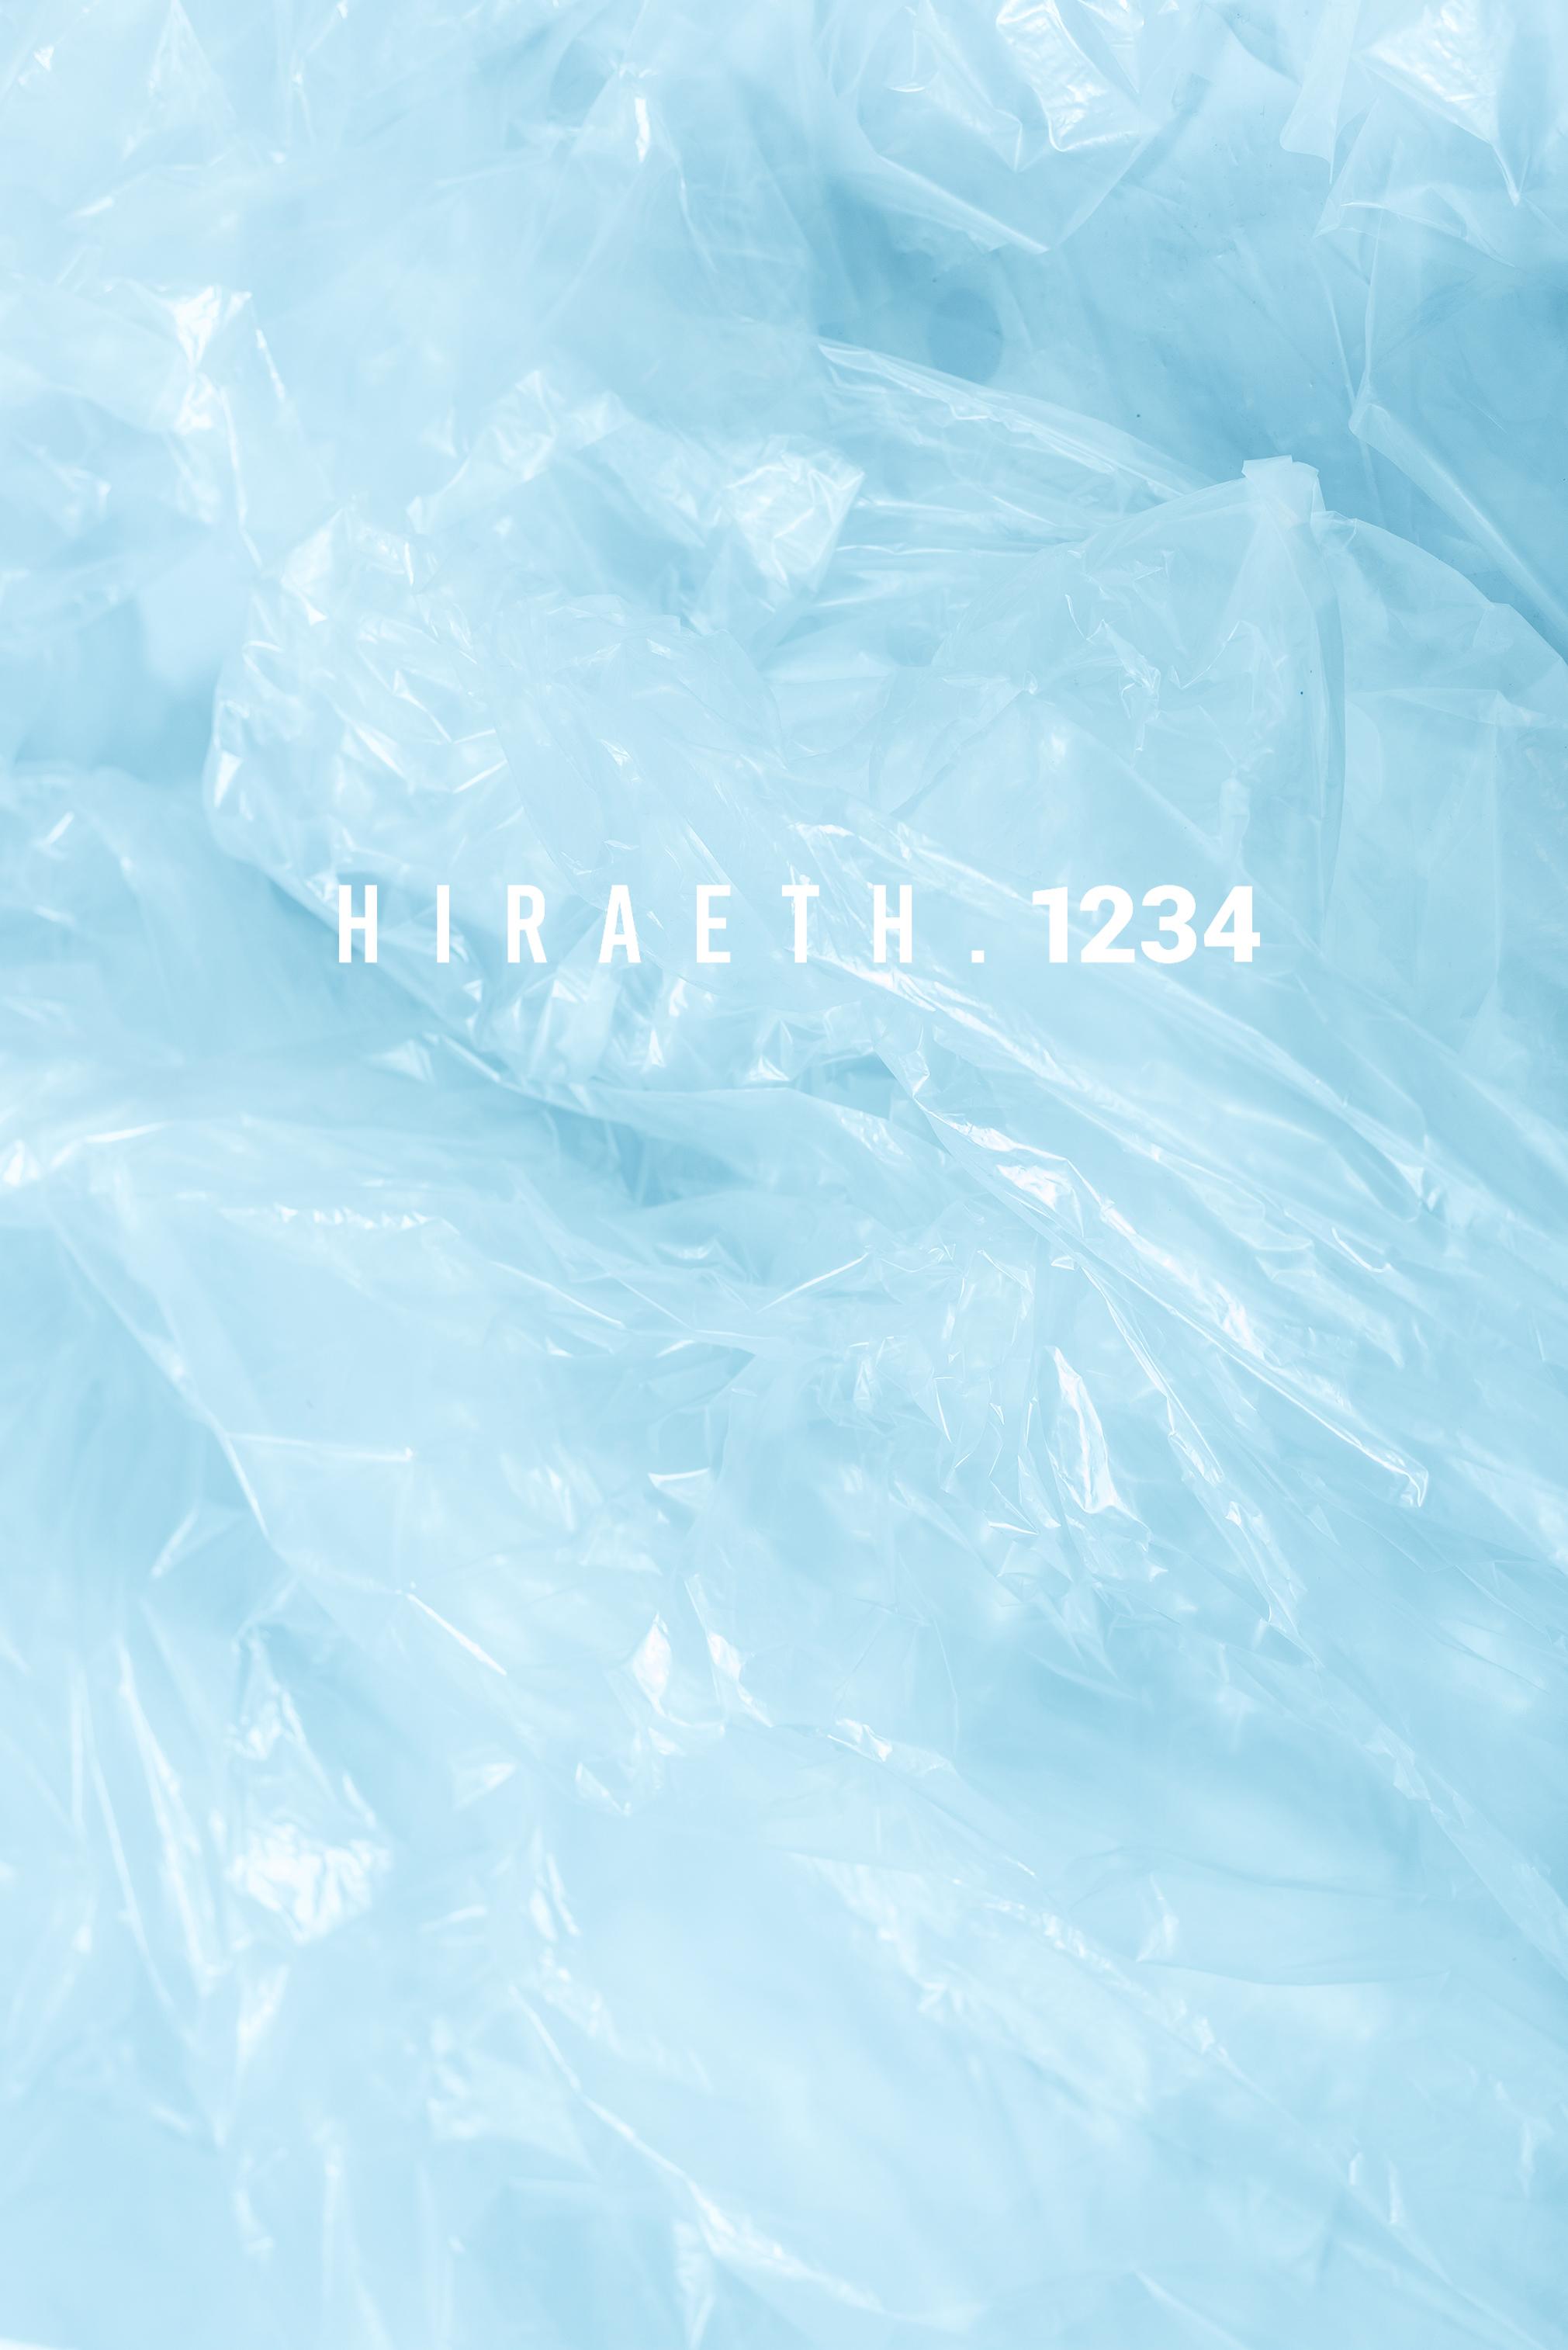 HIRAETH 1234